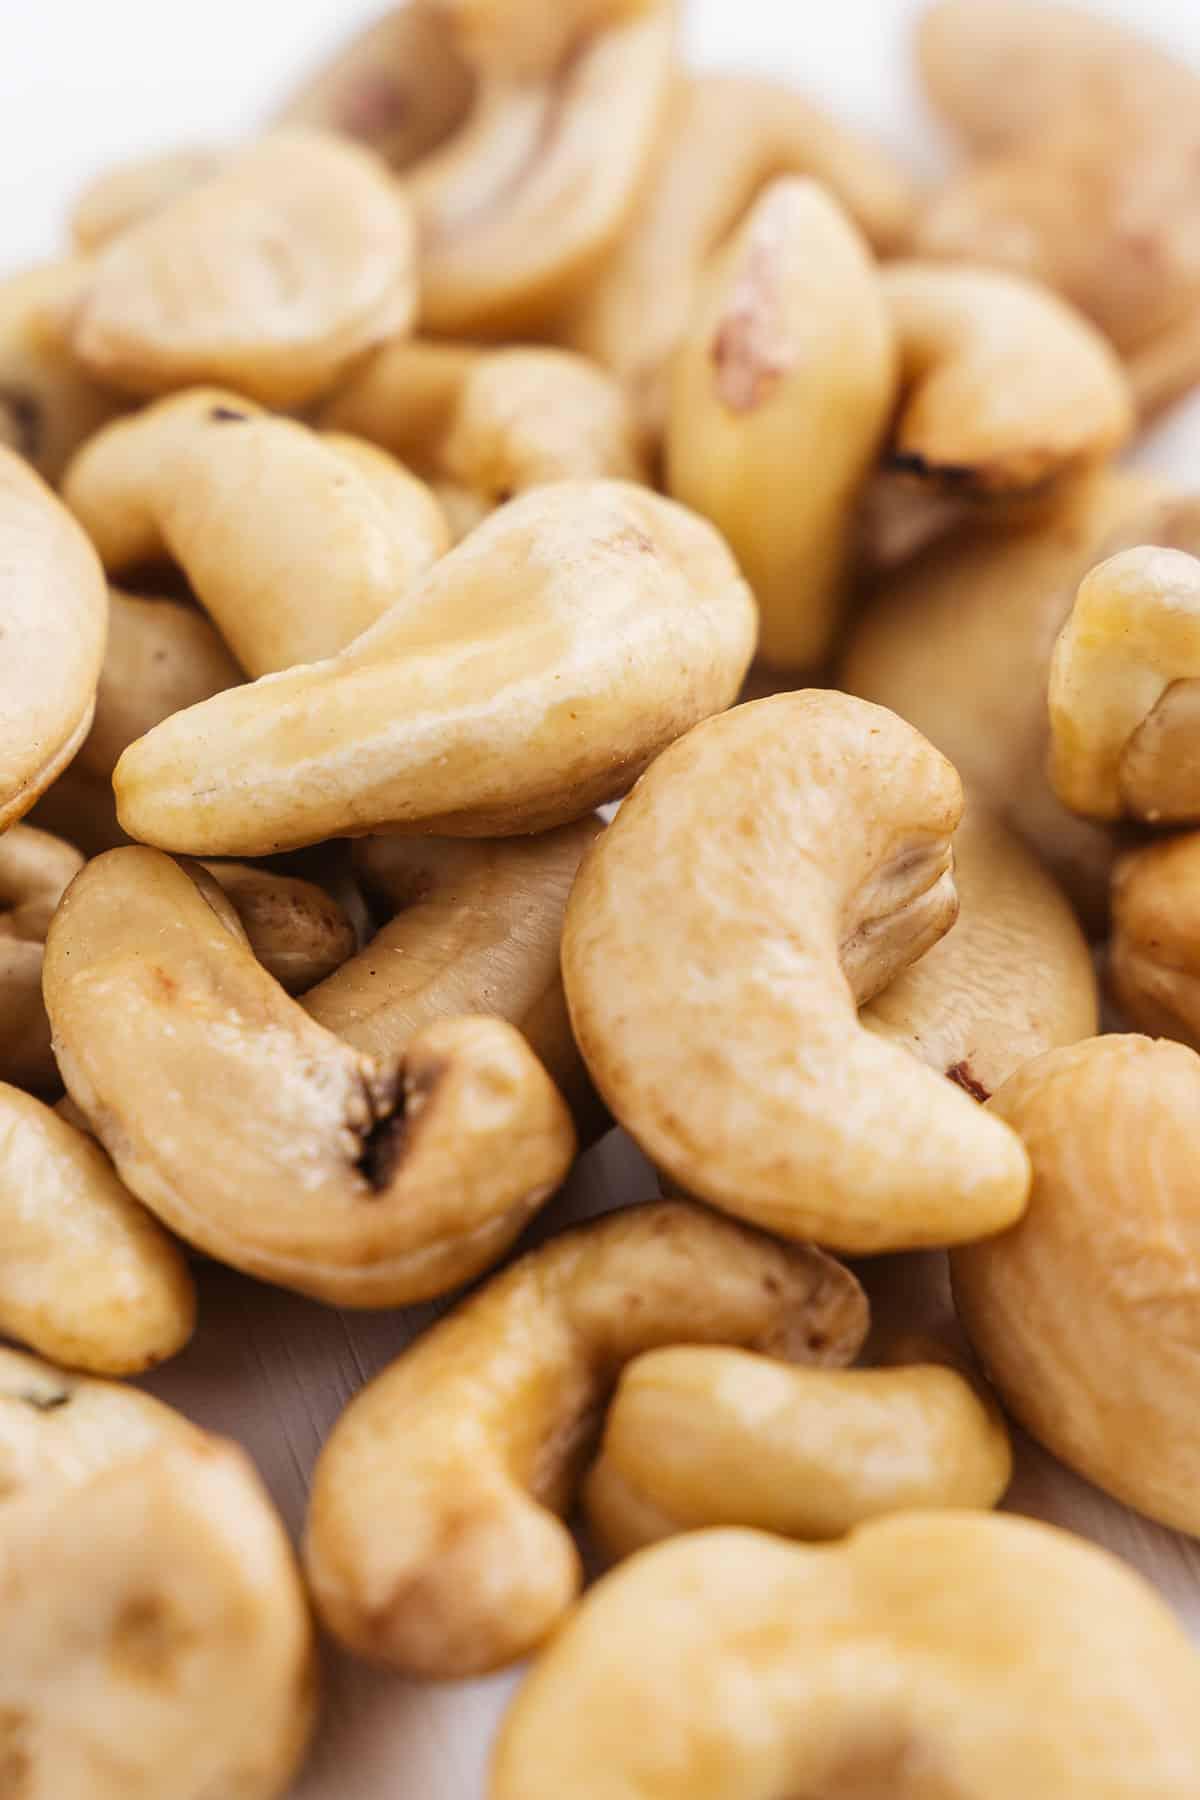 Close up of Cashews